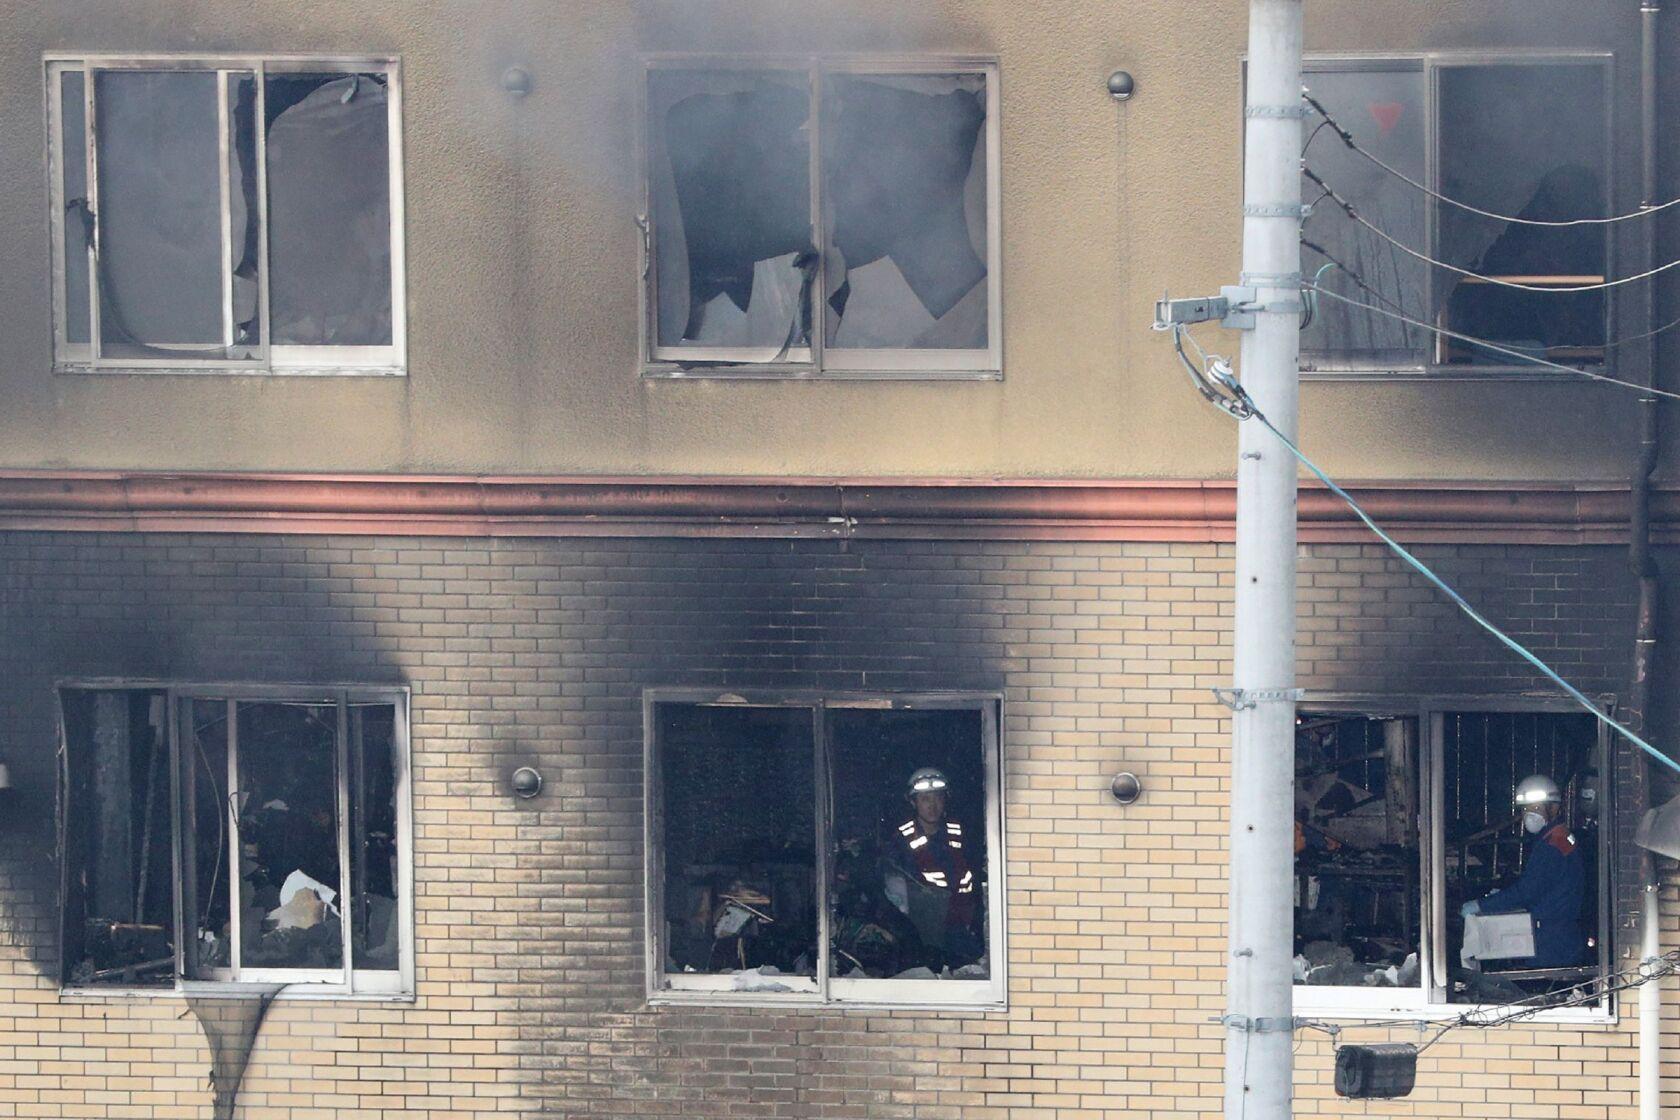 Japan anime studio fire: Man shouting 'You die' bursts in